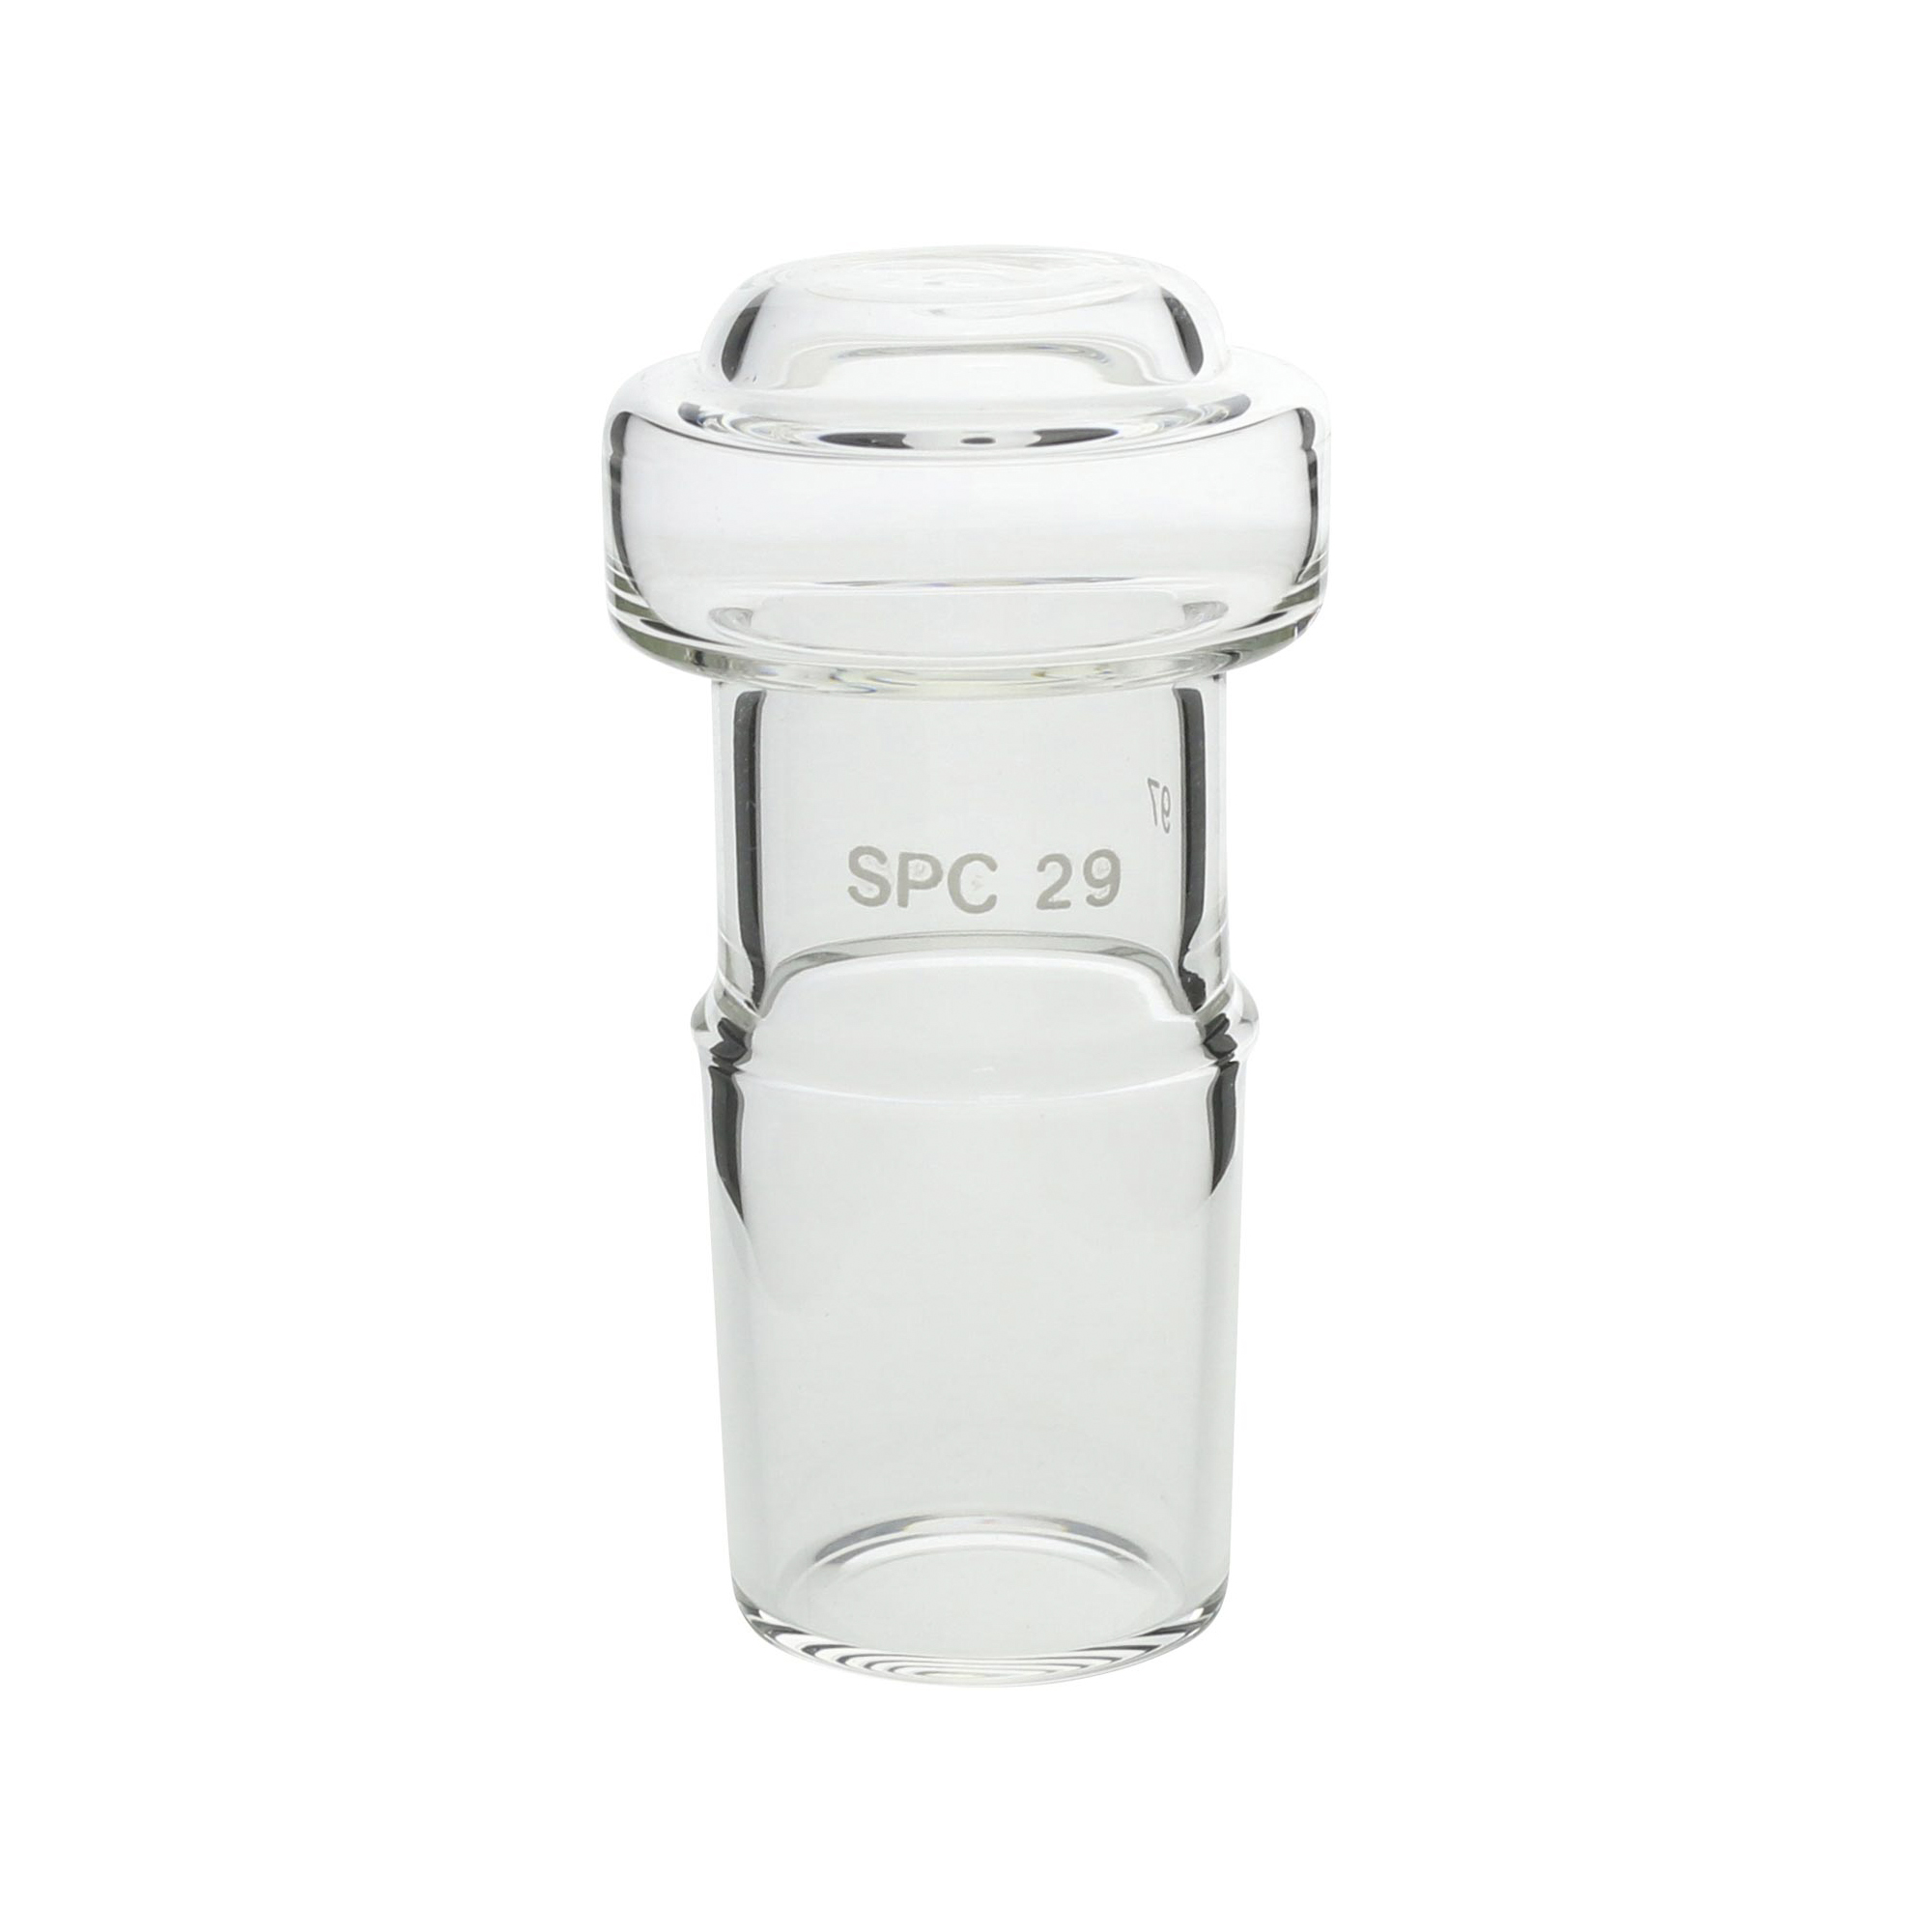 SPC平栓29 10个入|柴田科技有限公司-环境检测设备、科学仪器的制造销售